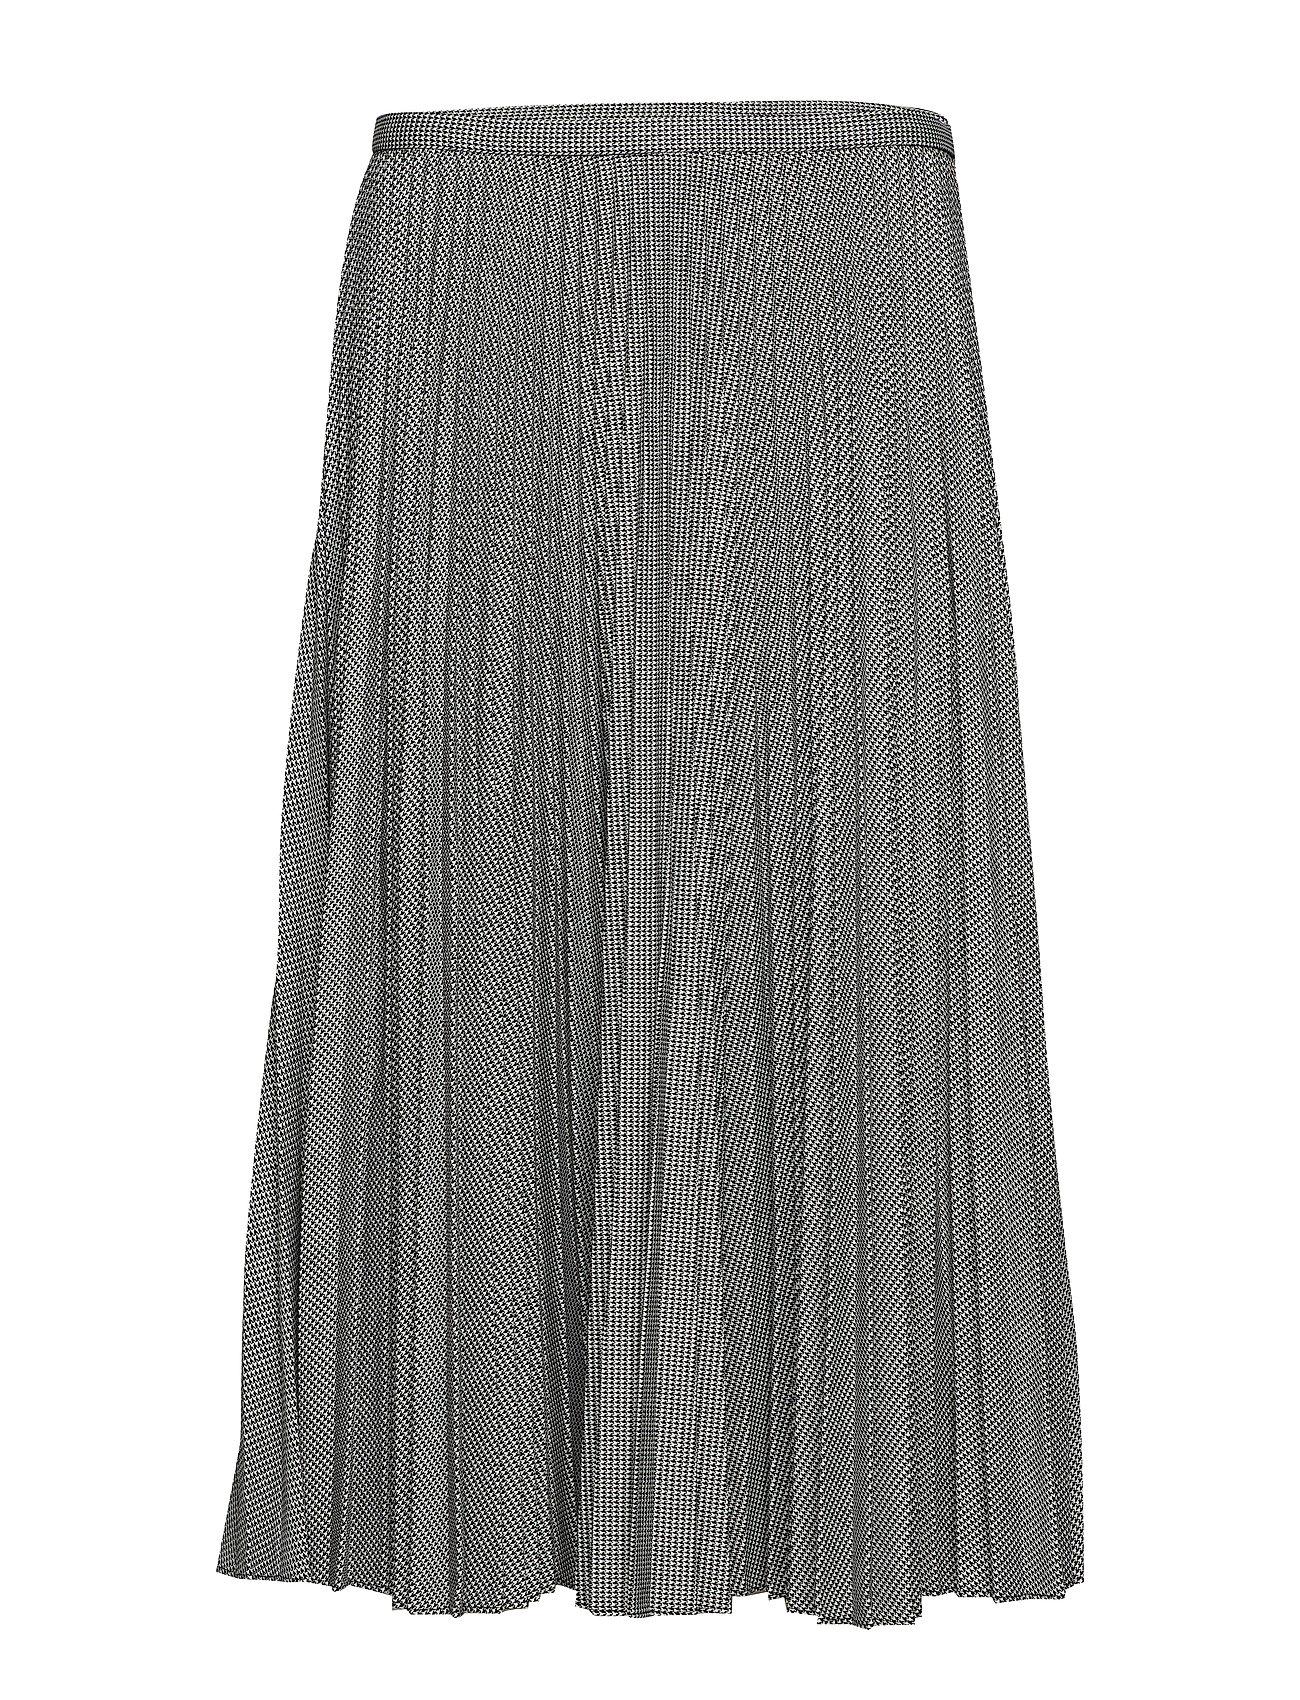 581187822 Pleated Twill A-line Skirt (Black/cream) (£79.75) - Lauren Ralph ...